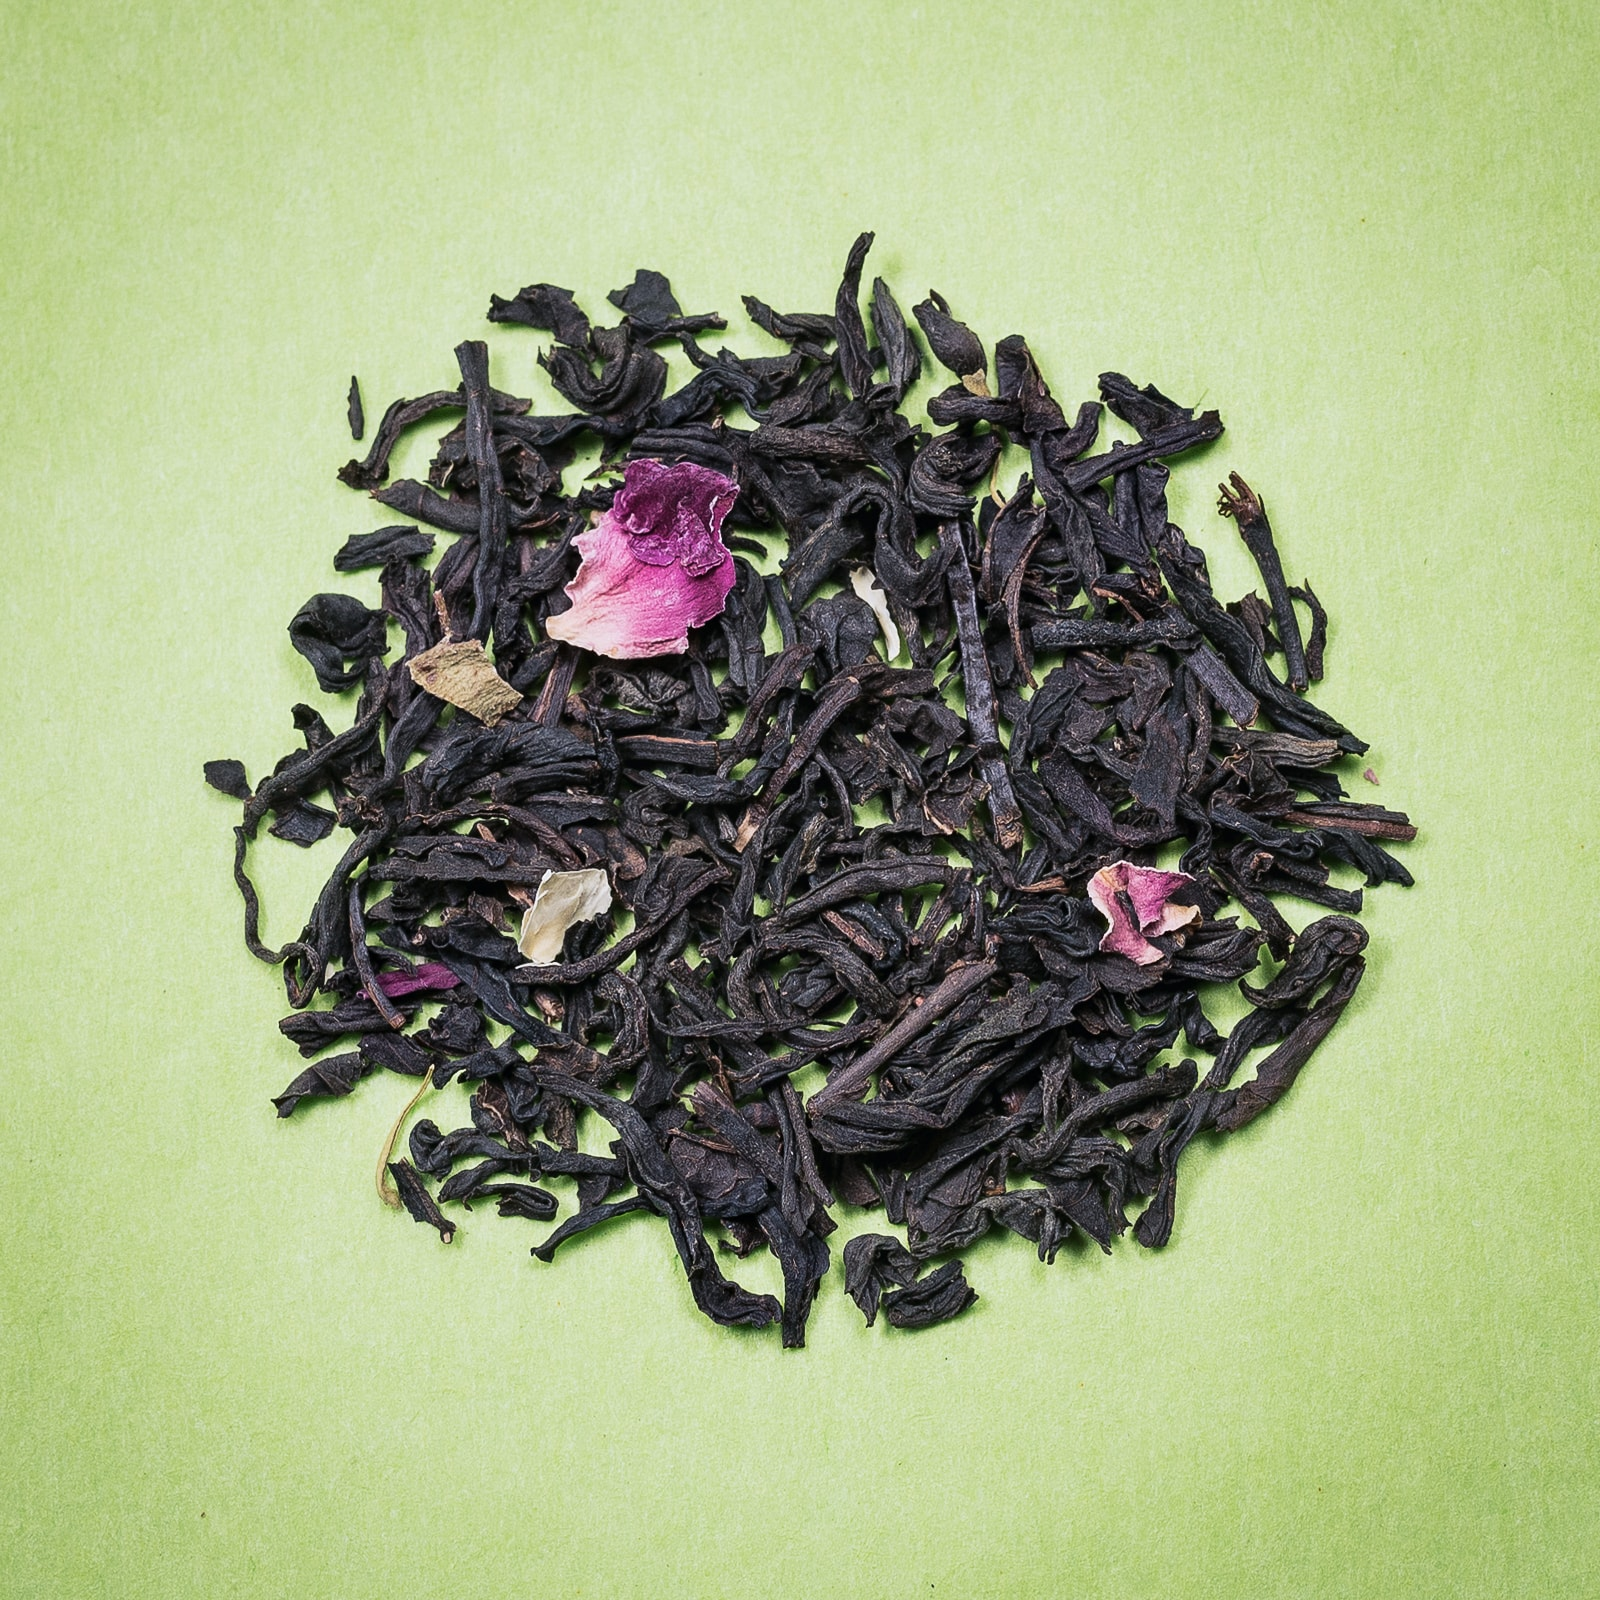 Anbassa-artisan-torrefacteur-the-noir-aromatise-Trois-Fleurs-GUP